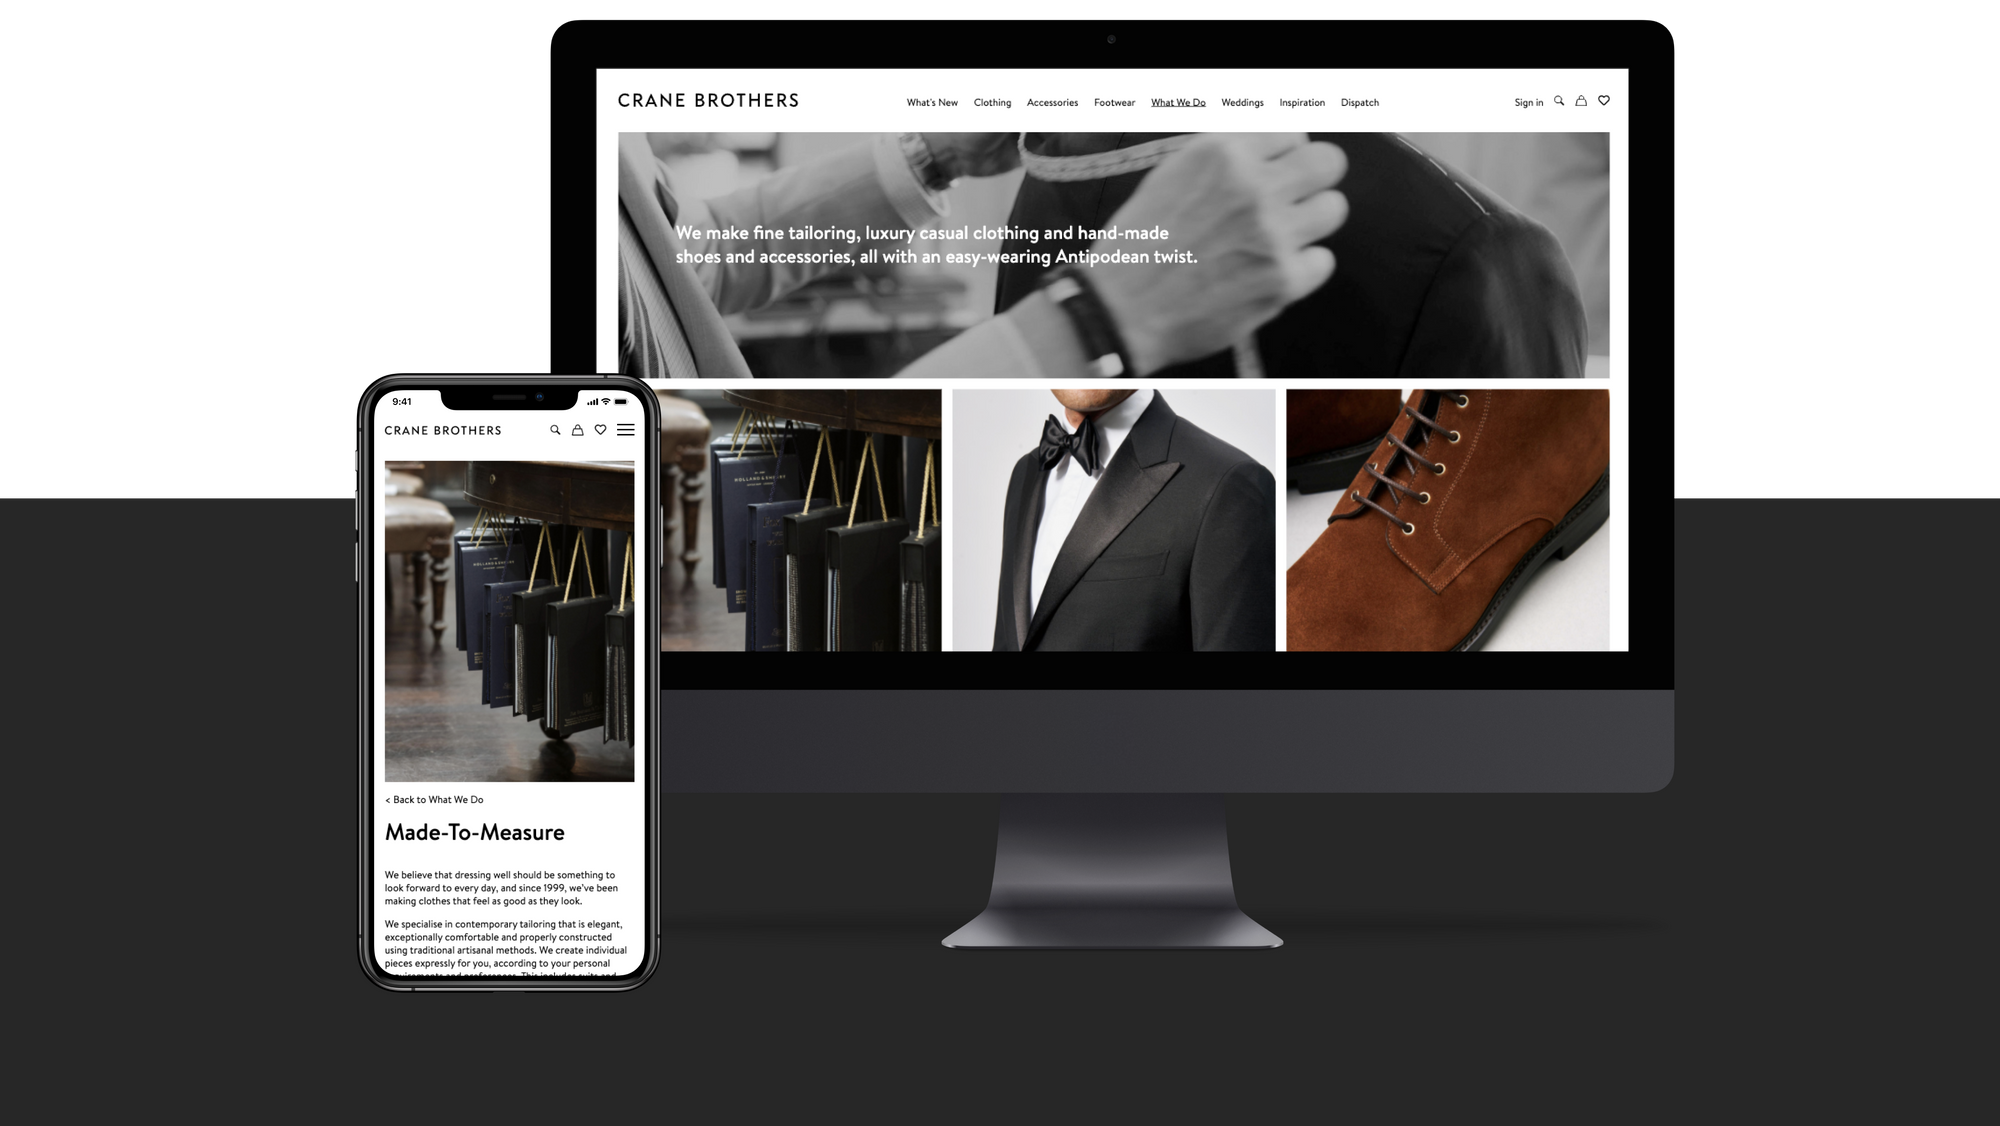 Crane Brothers - digital marketing